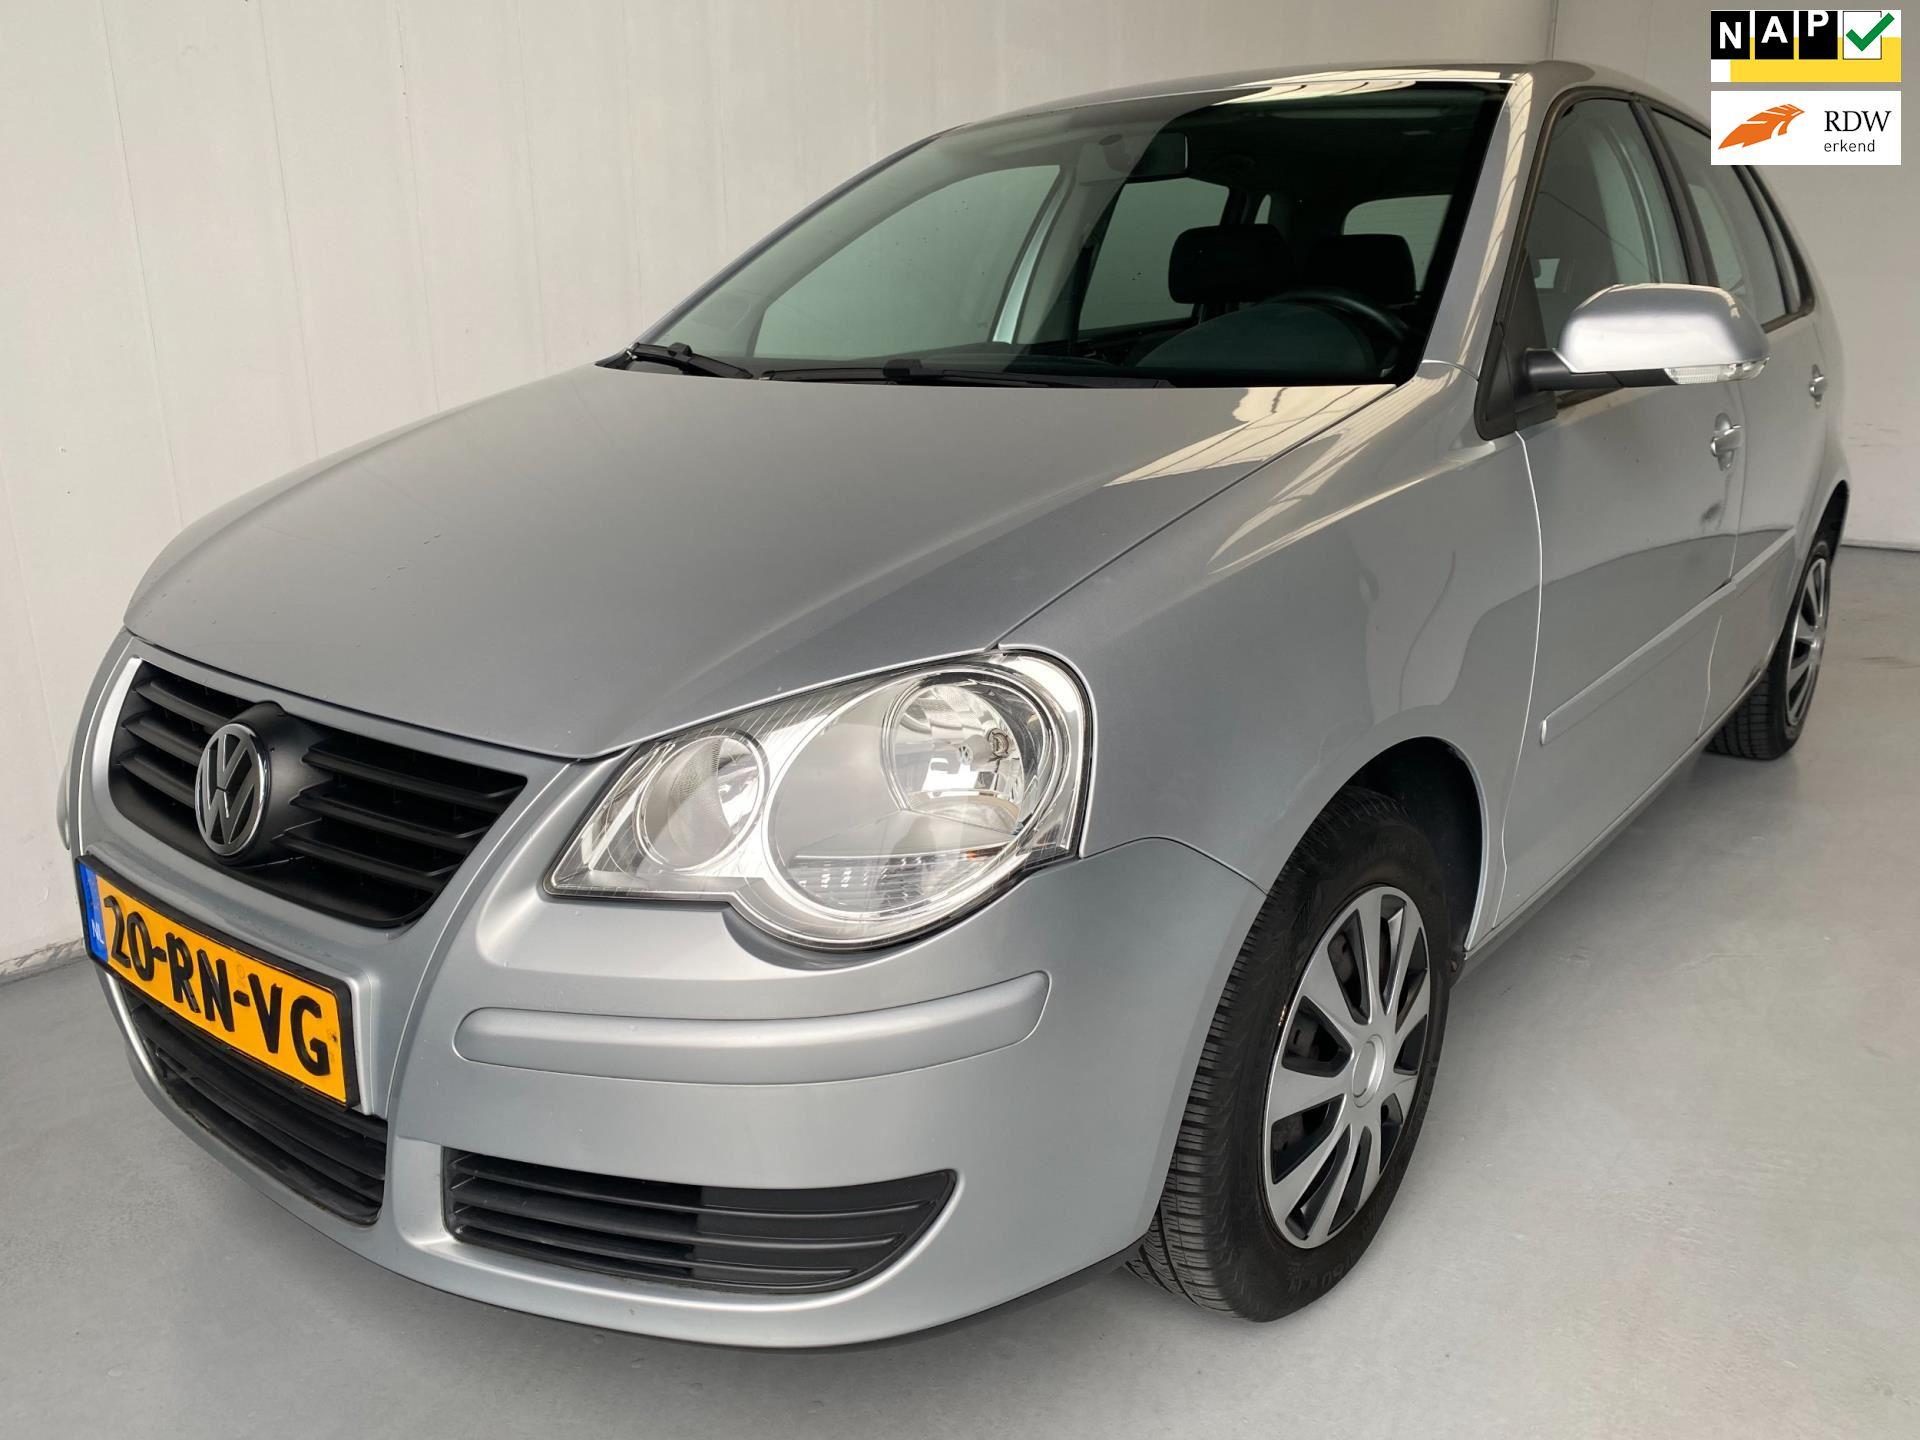 Volkswagen Polo occasion - Autobedrijf Leeuwis B.V.